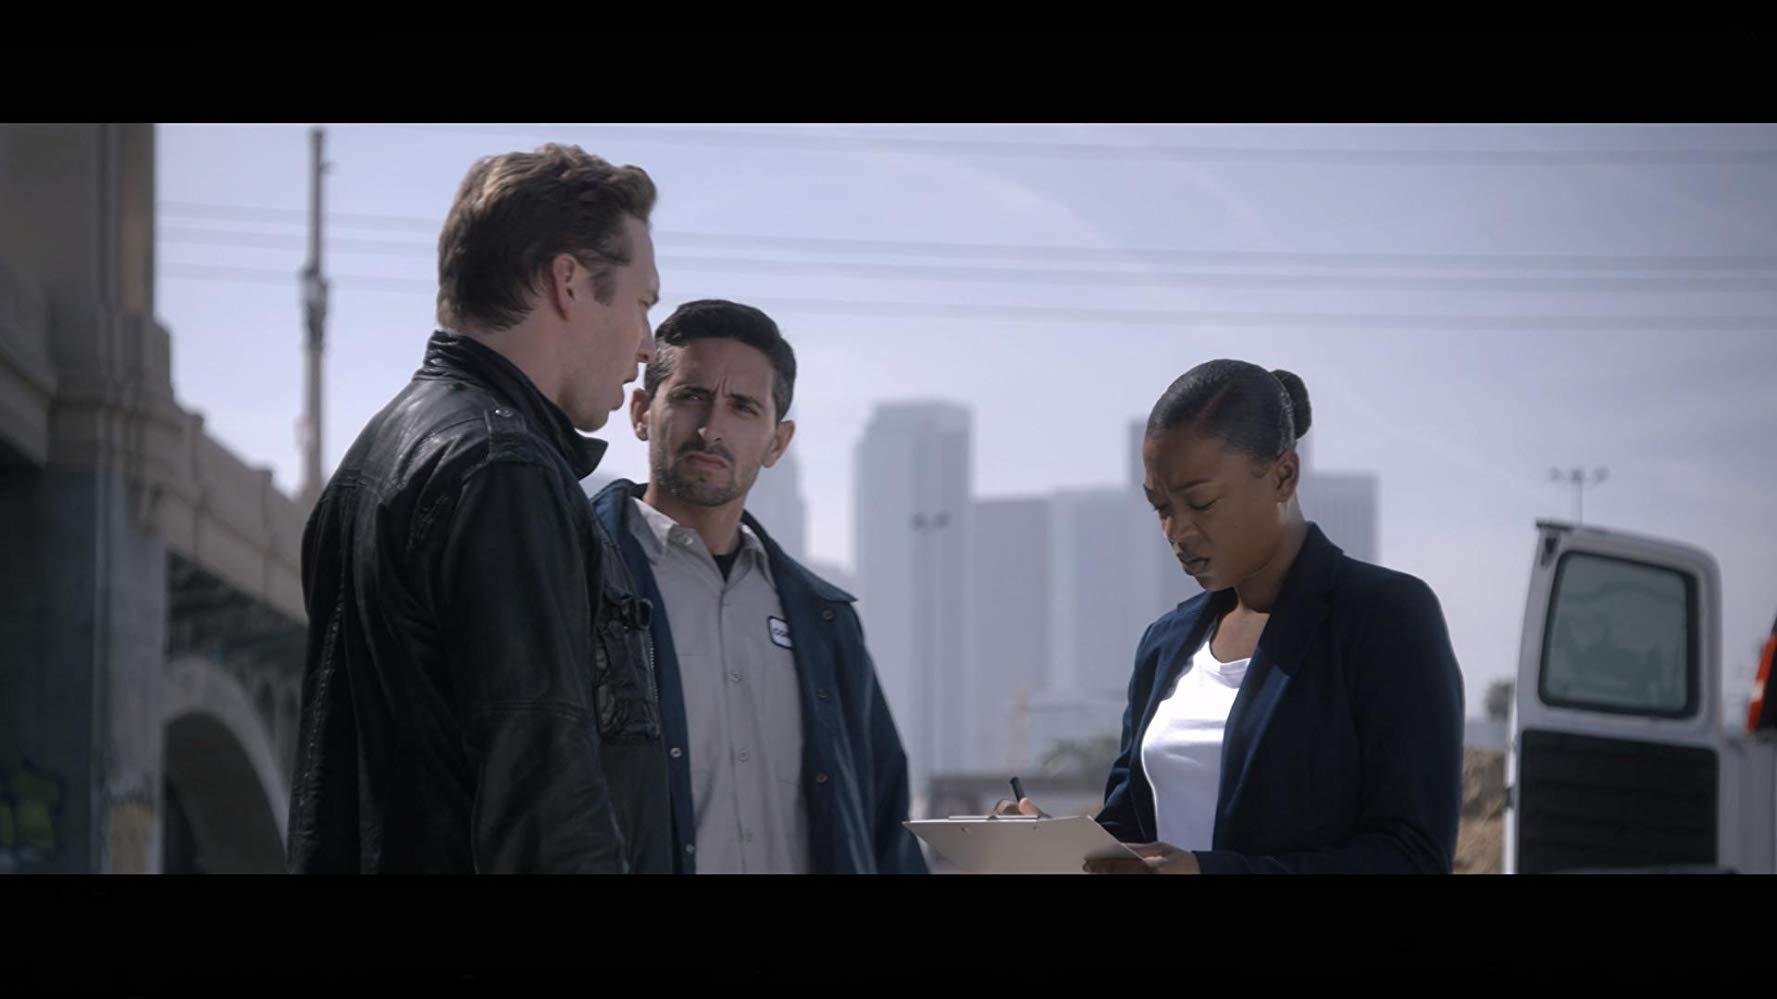 Ryan Hansen Solves Crimes on Television - Season 2